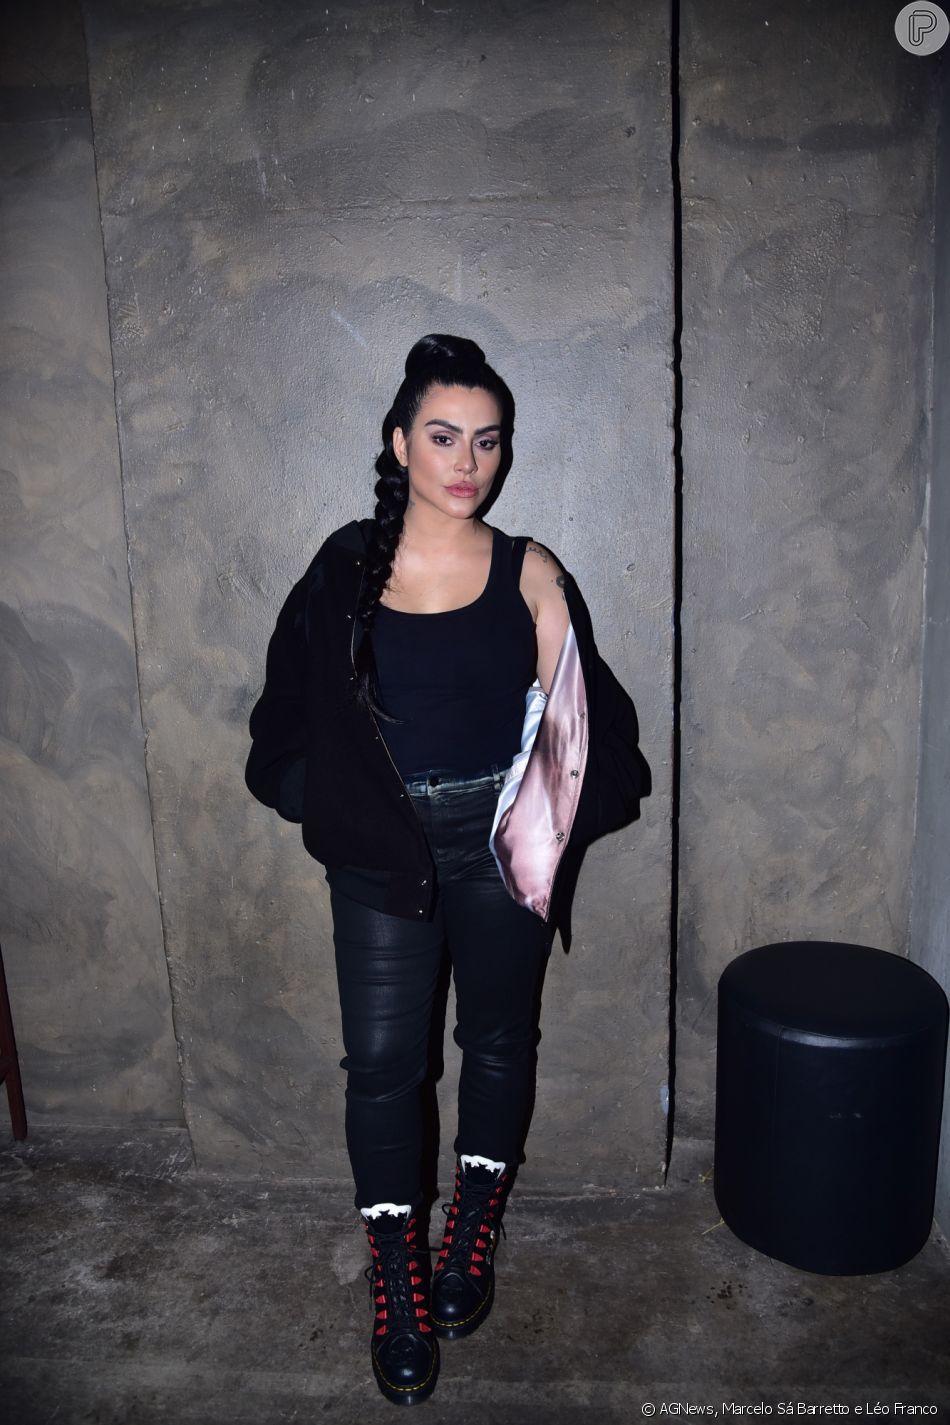 Cleo usou casaco de moletom, jeans da Diesel Brasil e coturno Dr. Martens